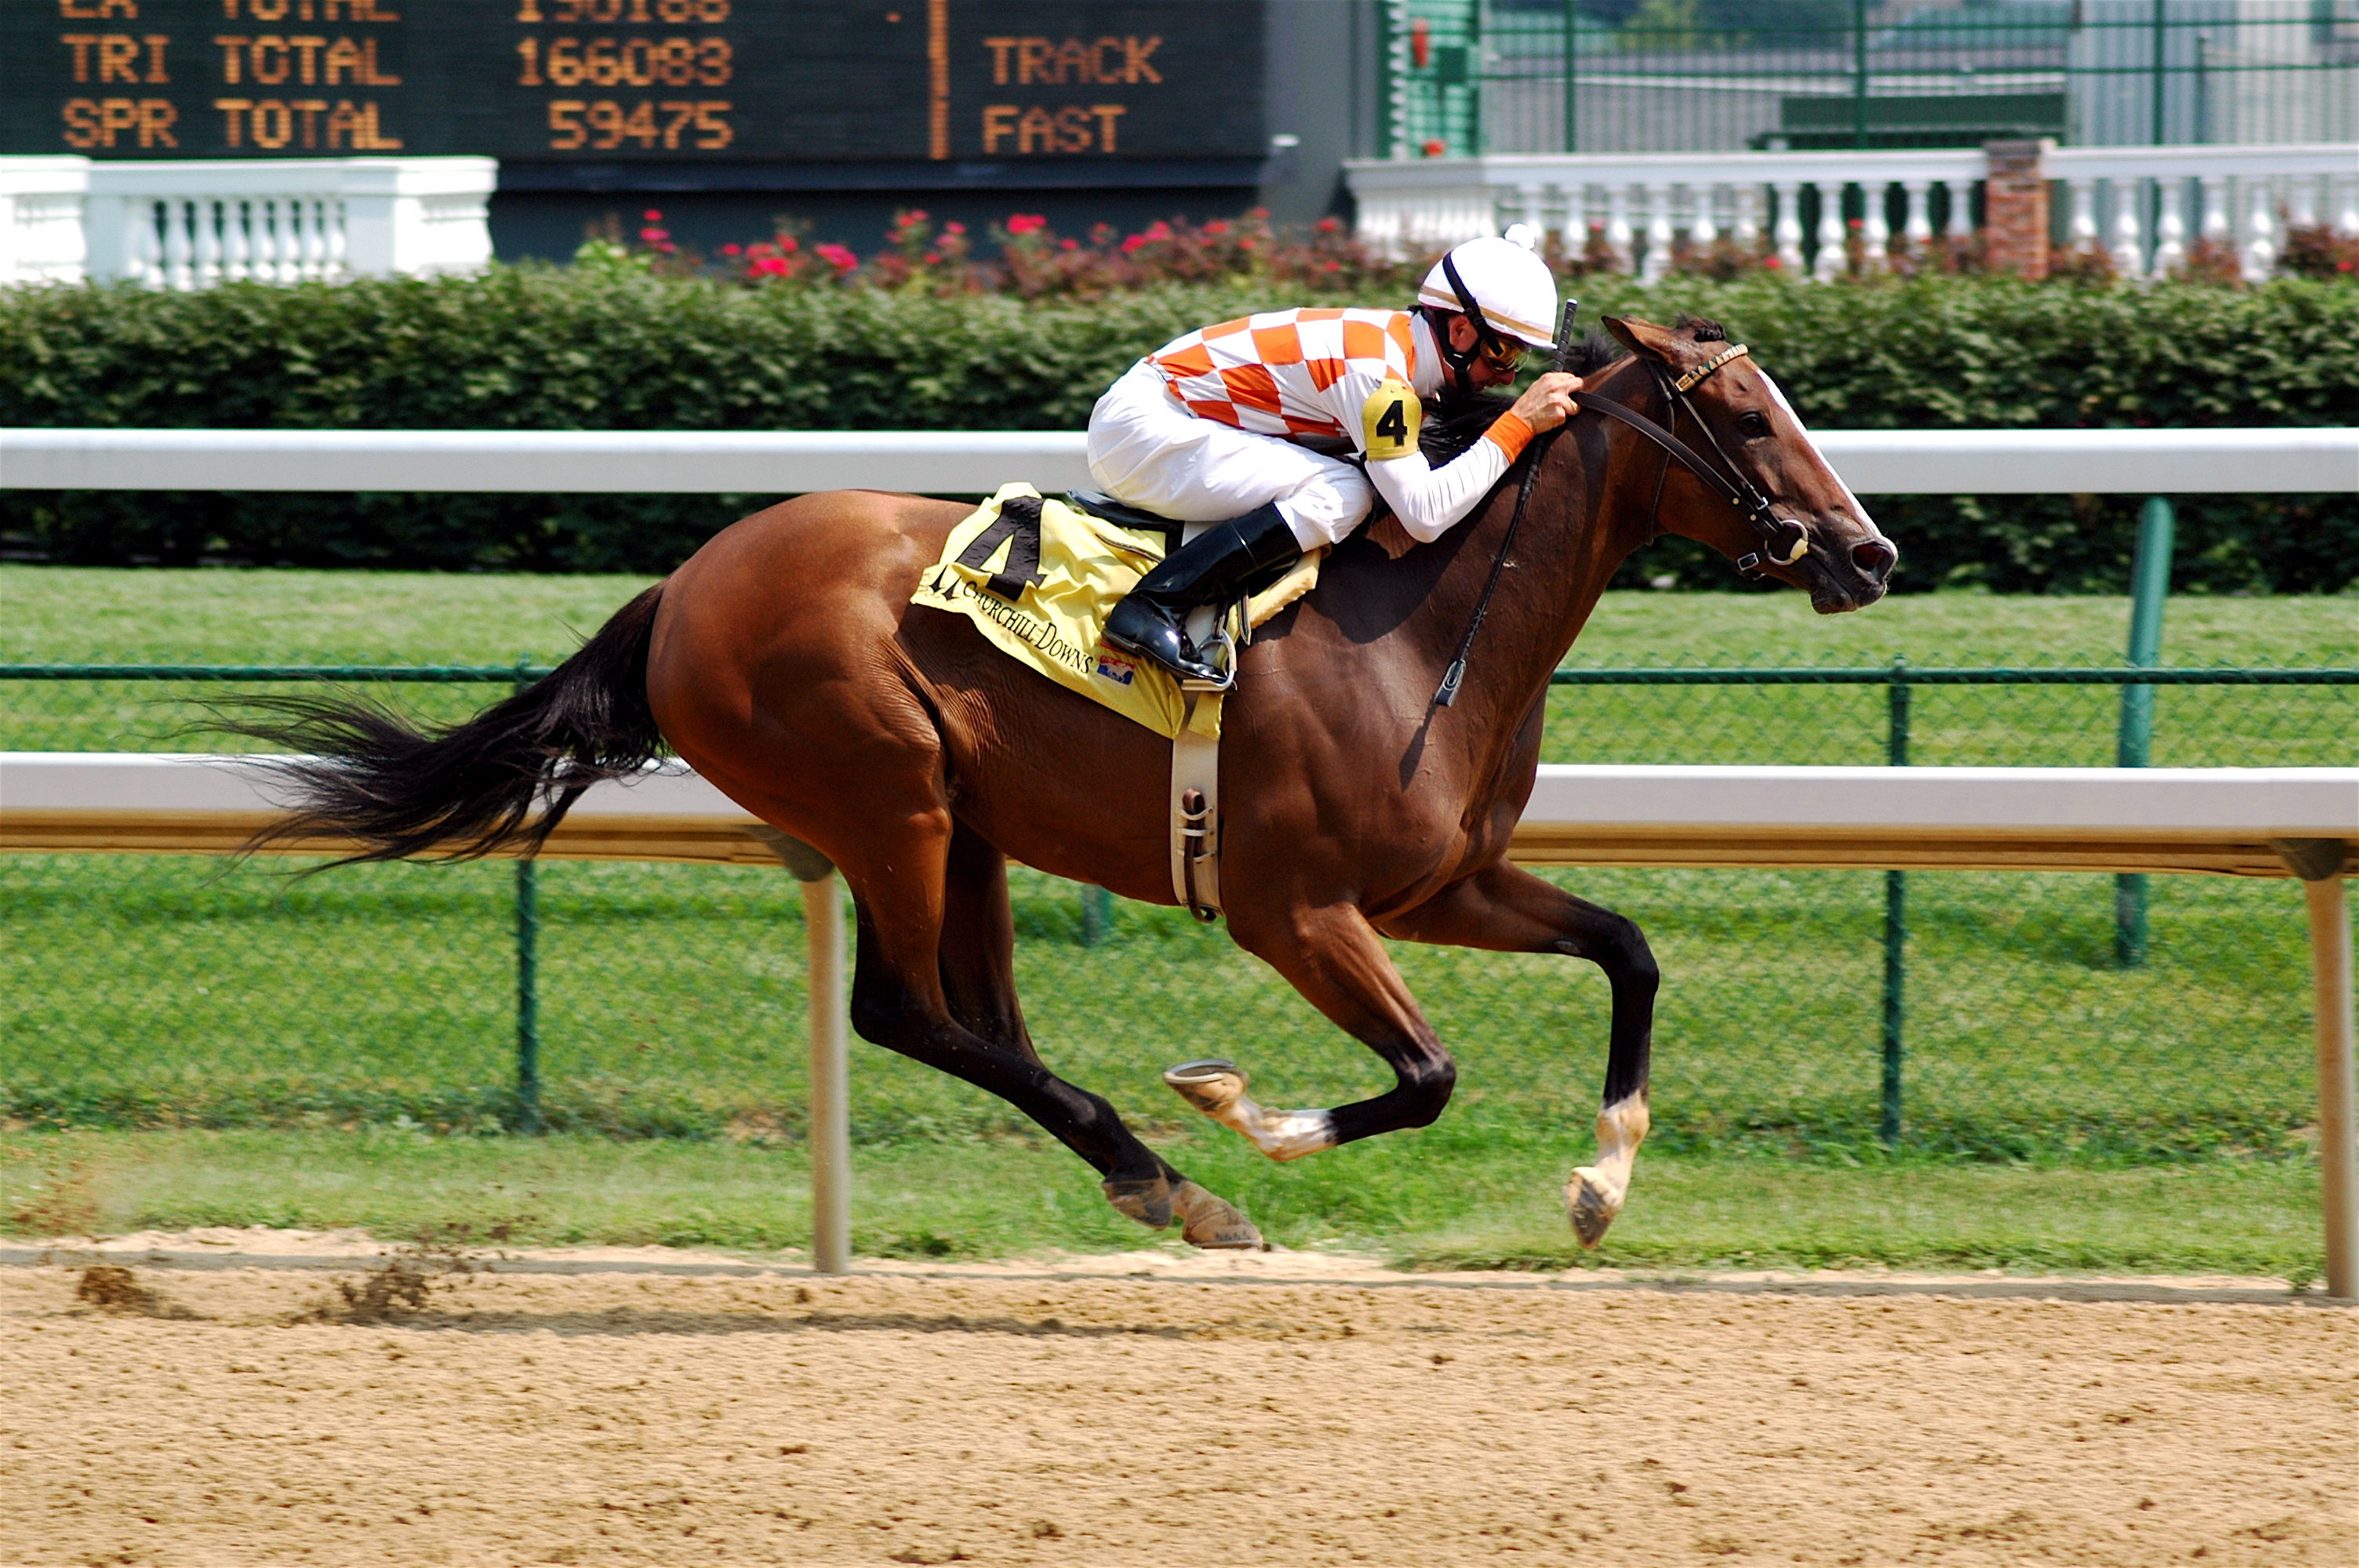 horse_racing_photo.jpg